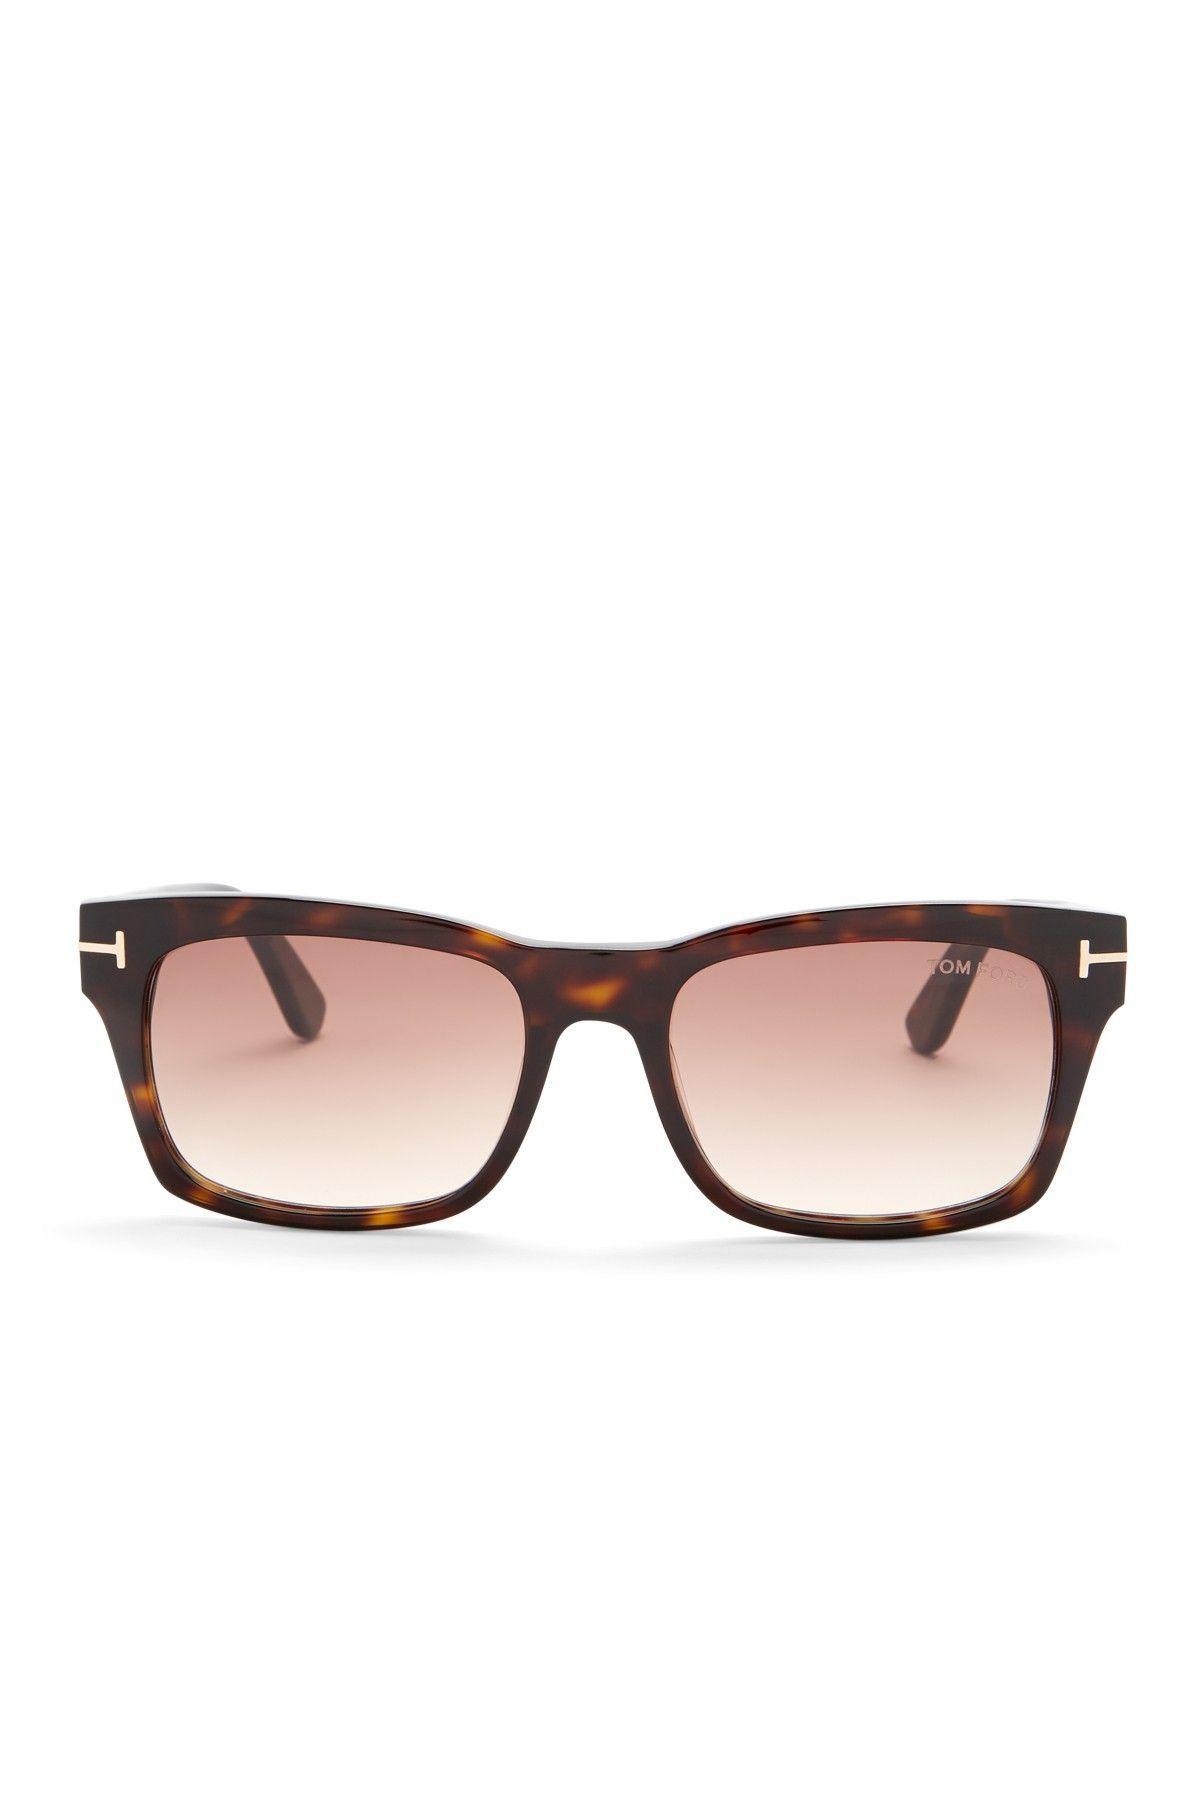 16 Stunning Tom Ford Oversized Sunglasses Inspiring Ideas